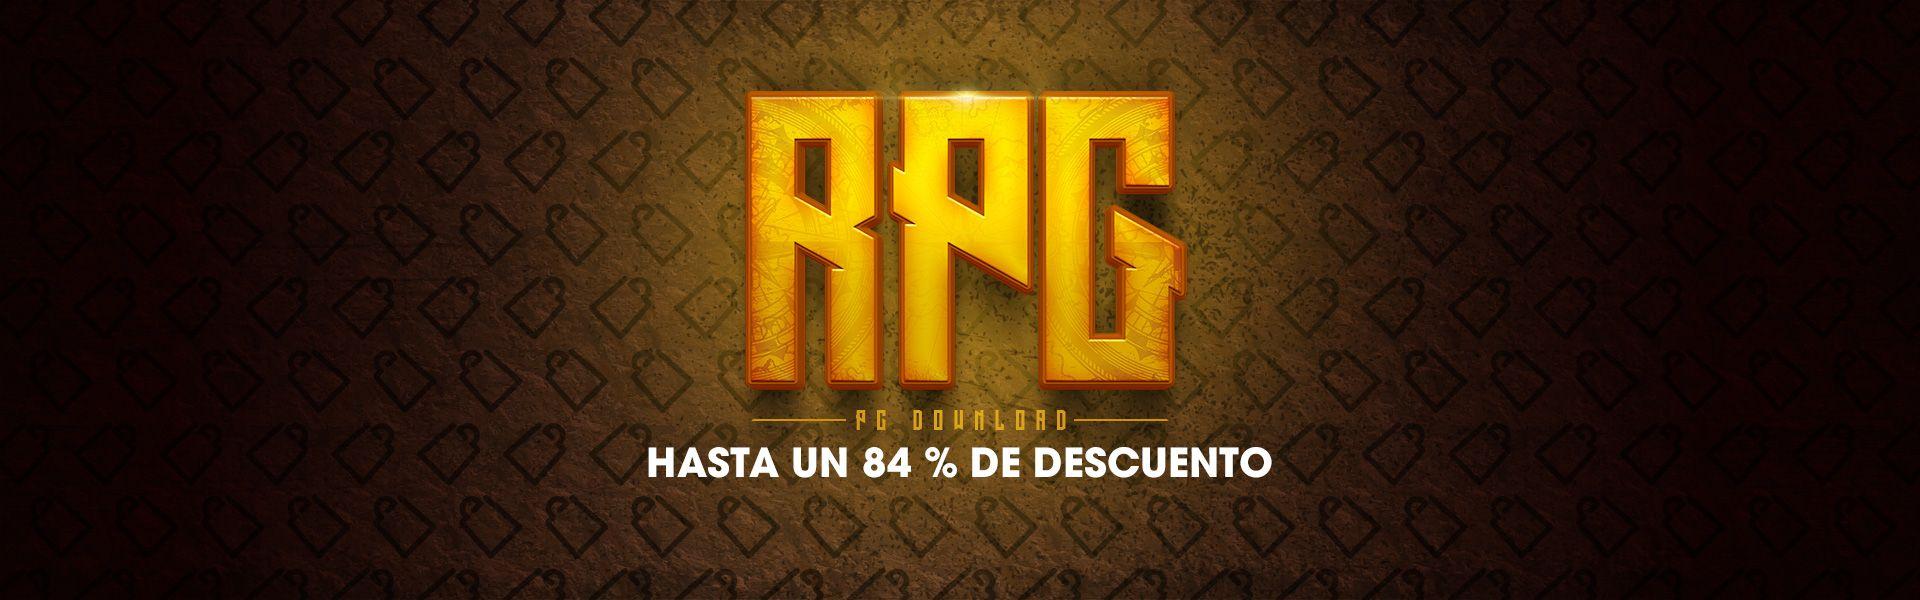 RPG - pc download